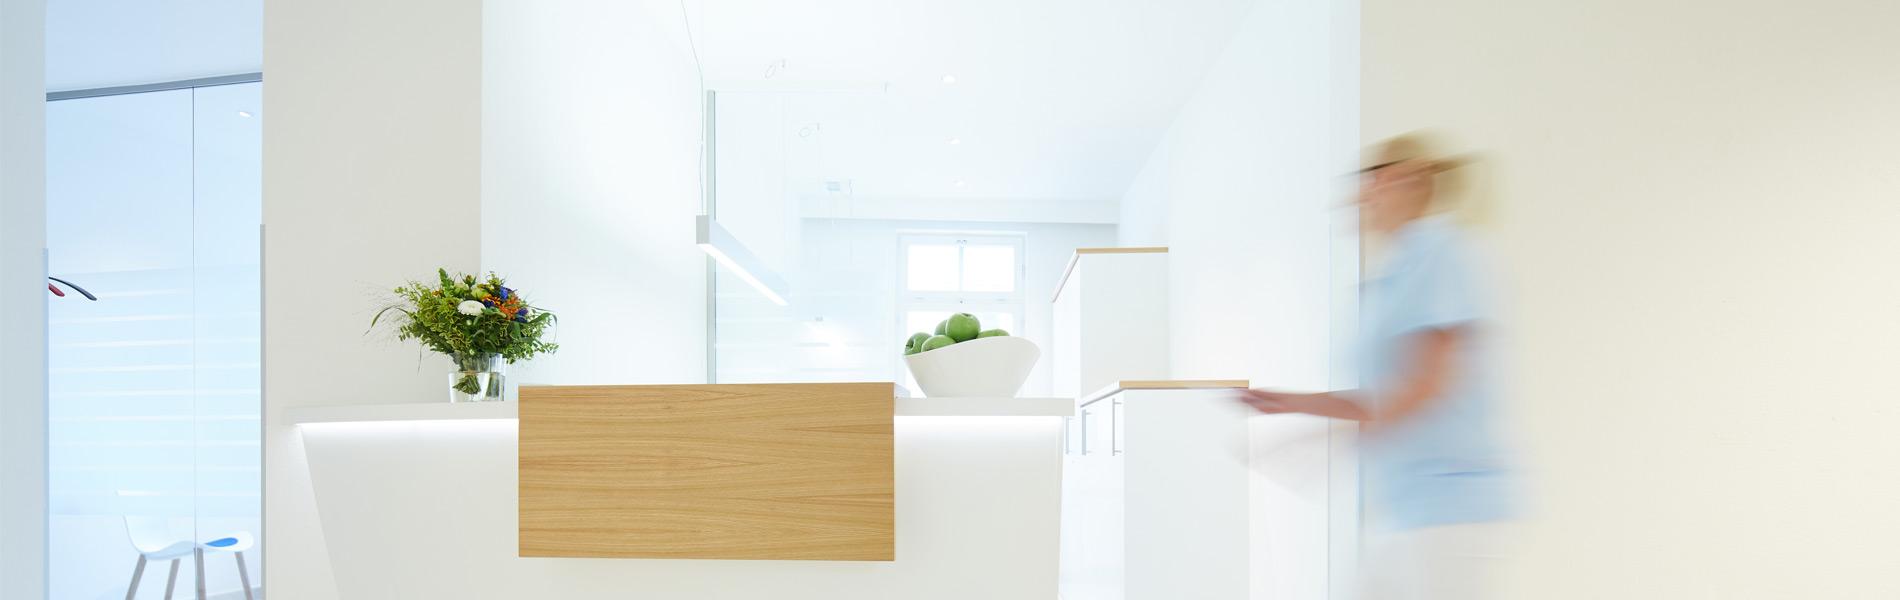 Zahnarztpraxis Dr. Wiesner - Ihr Zahnarzt in Tübingen – Dr. Wiesner 1